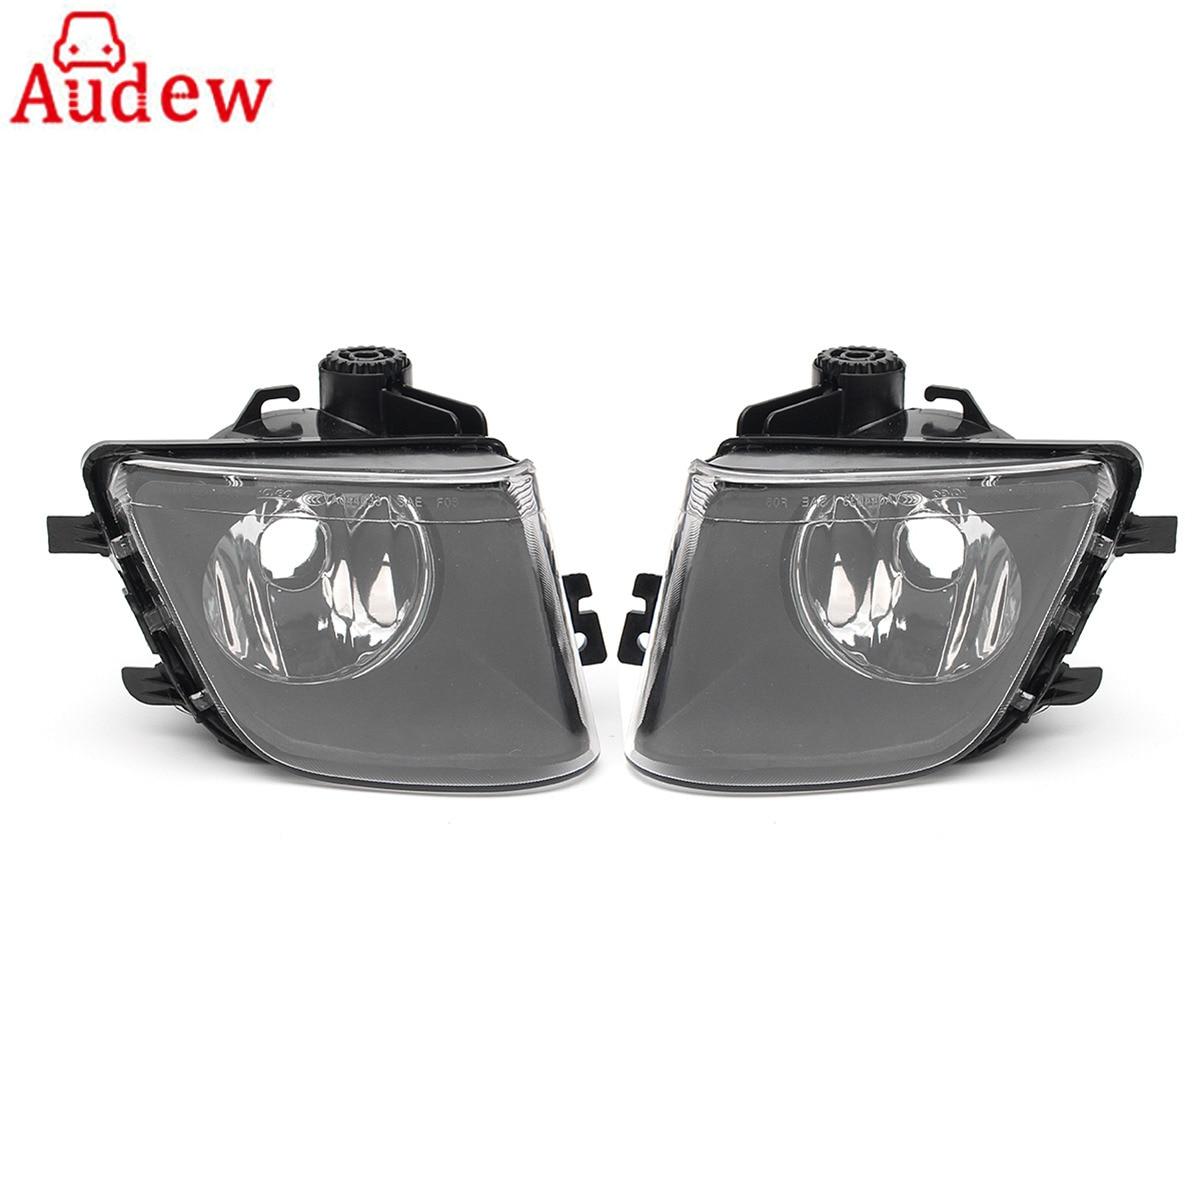 For BMW F01 F02 740i 740Li 750i 2009-2013 1 Pair Fog Driving Light Clear Lens Left&RightFor BMW F01 F02 740i 740Li 750i 2009-2013 1 Pair Fog Driving Light Clear Lens Left&Right